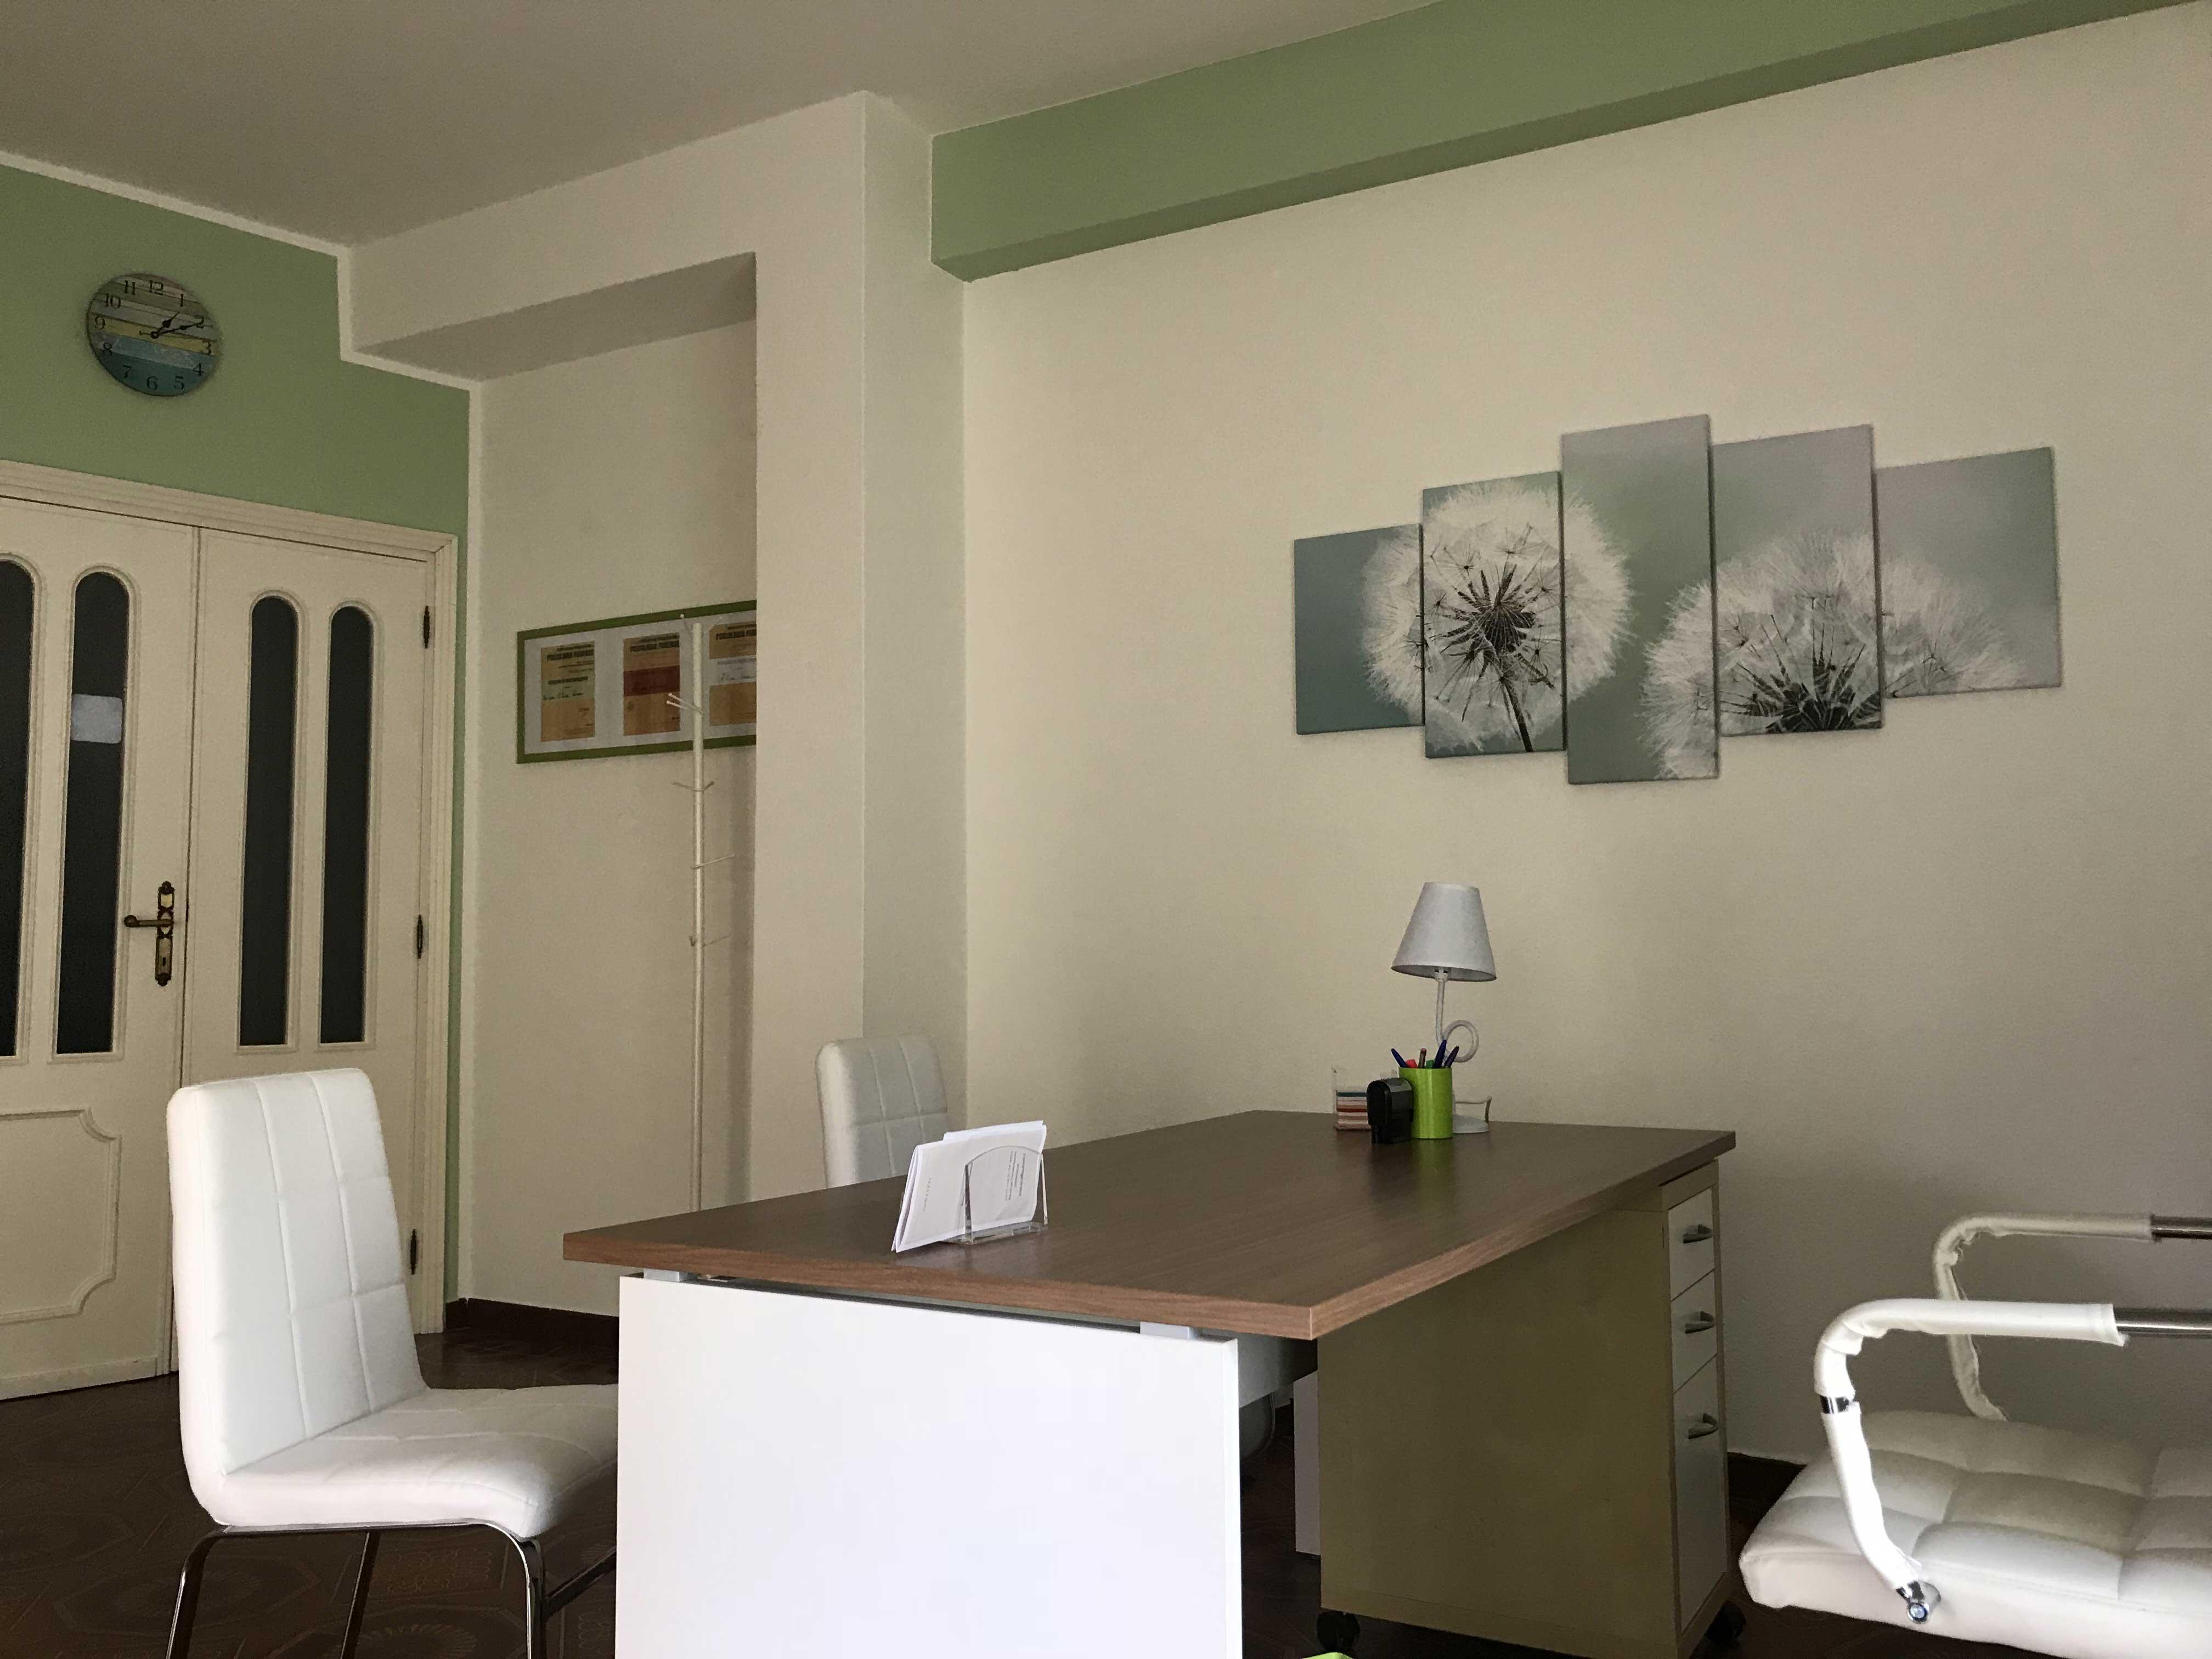 Studio-psicologa-Nuoro-Arca-quadro-verde